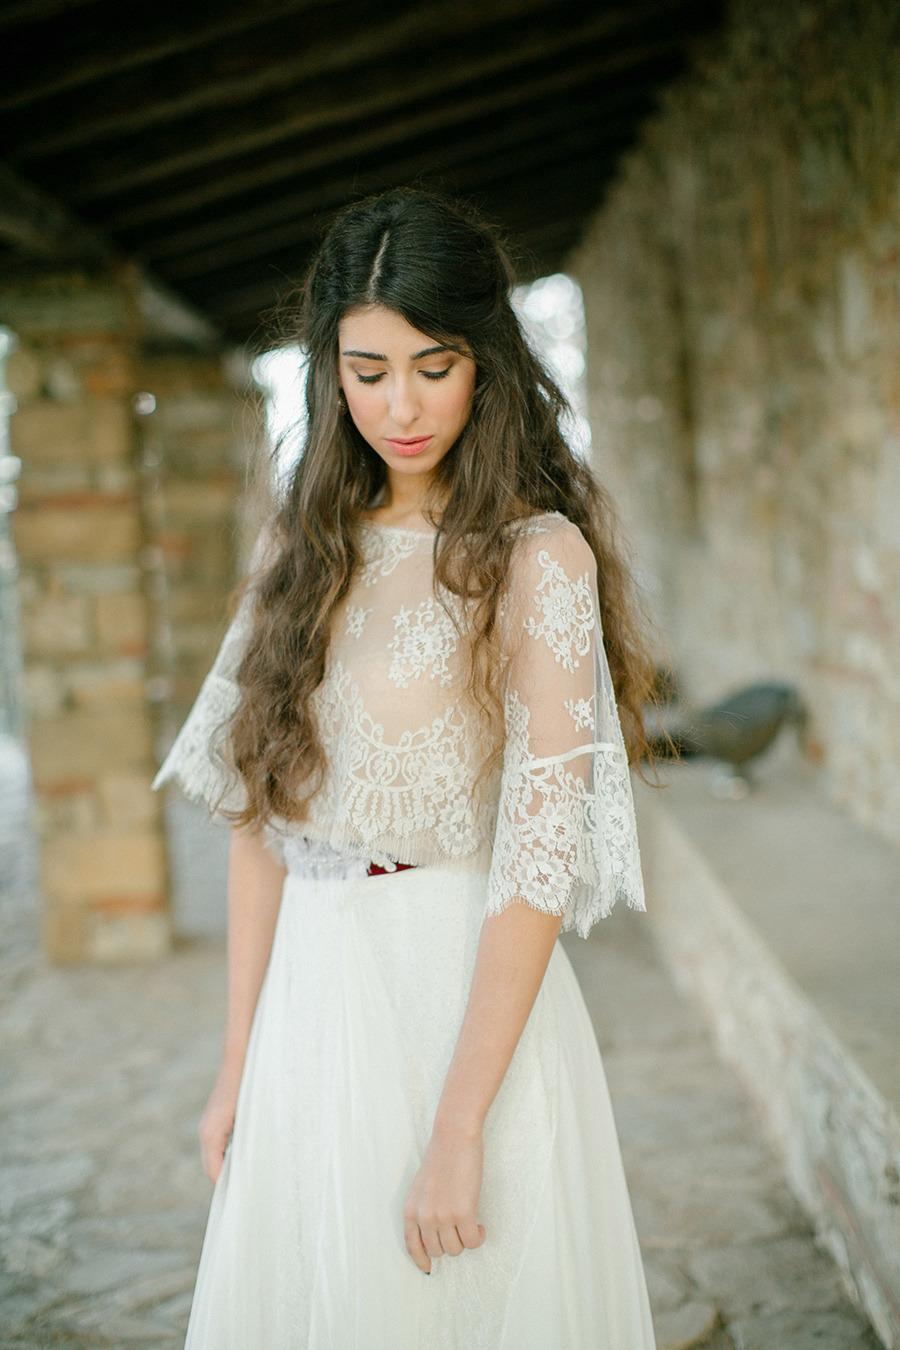 lace wedding dress - Boho Chic Wedding Inspiration Shoot from Anna Roussos Photography - annaroussos.com | Read more : http://www.fabmood.com/boho-chic-wedding-inspiration-shoot-anna-roussos-photography